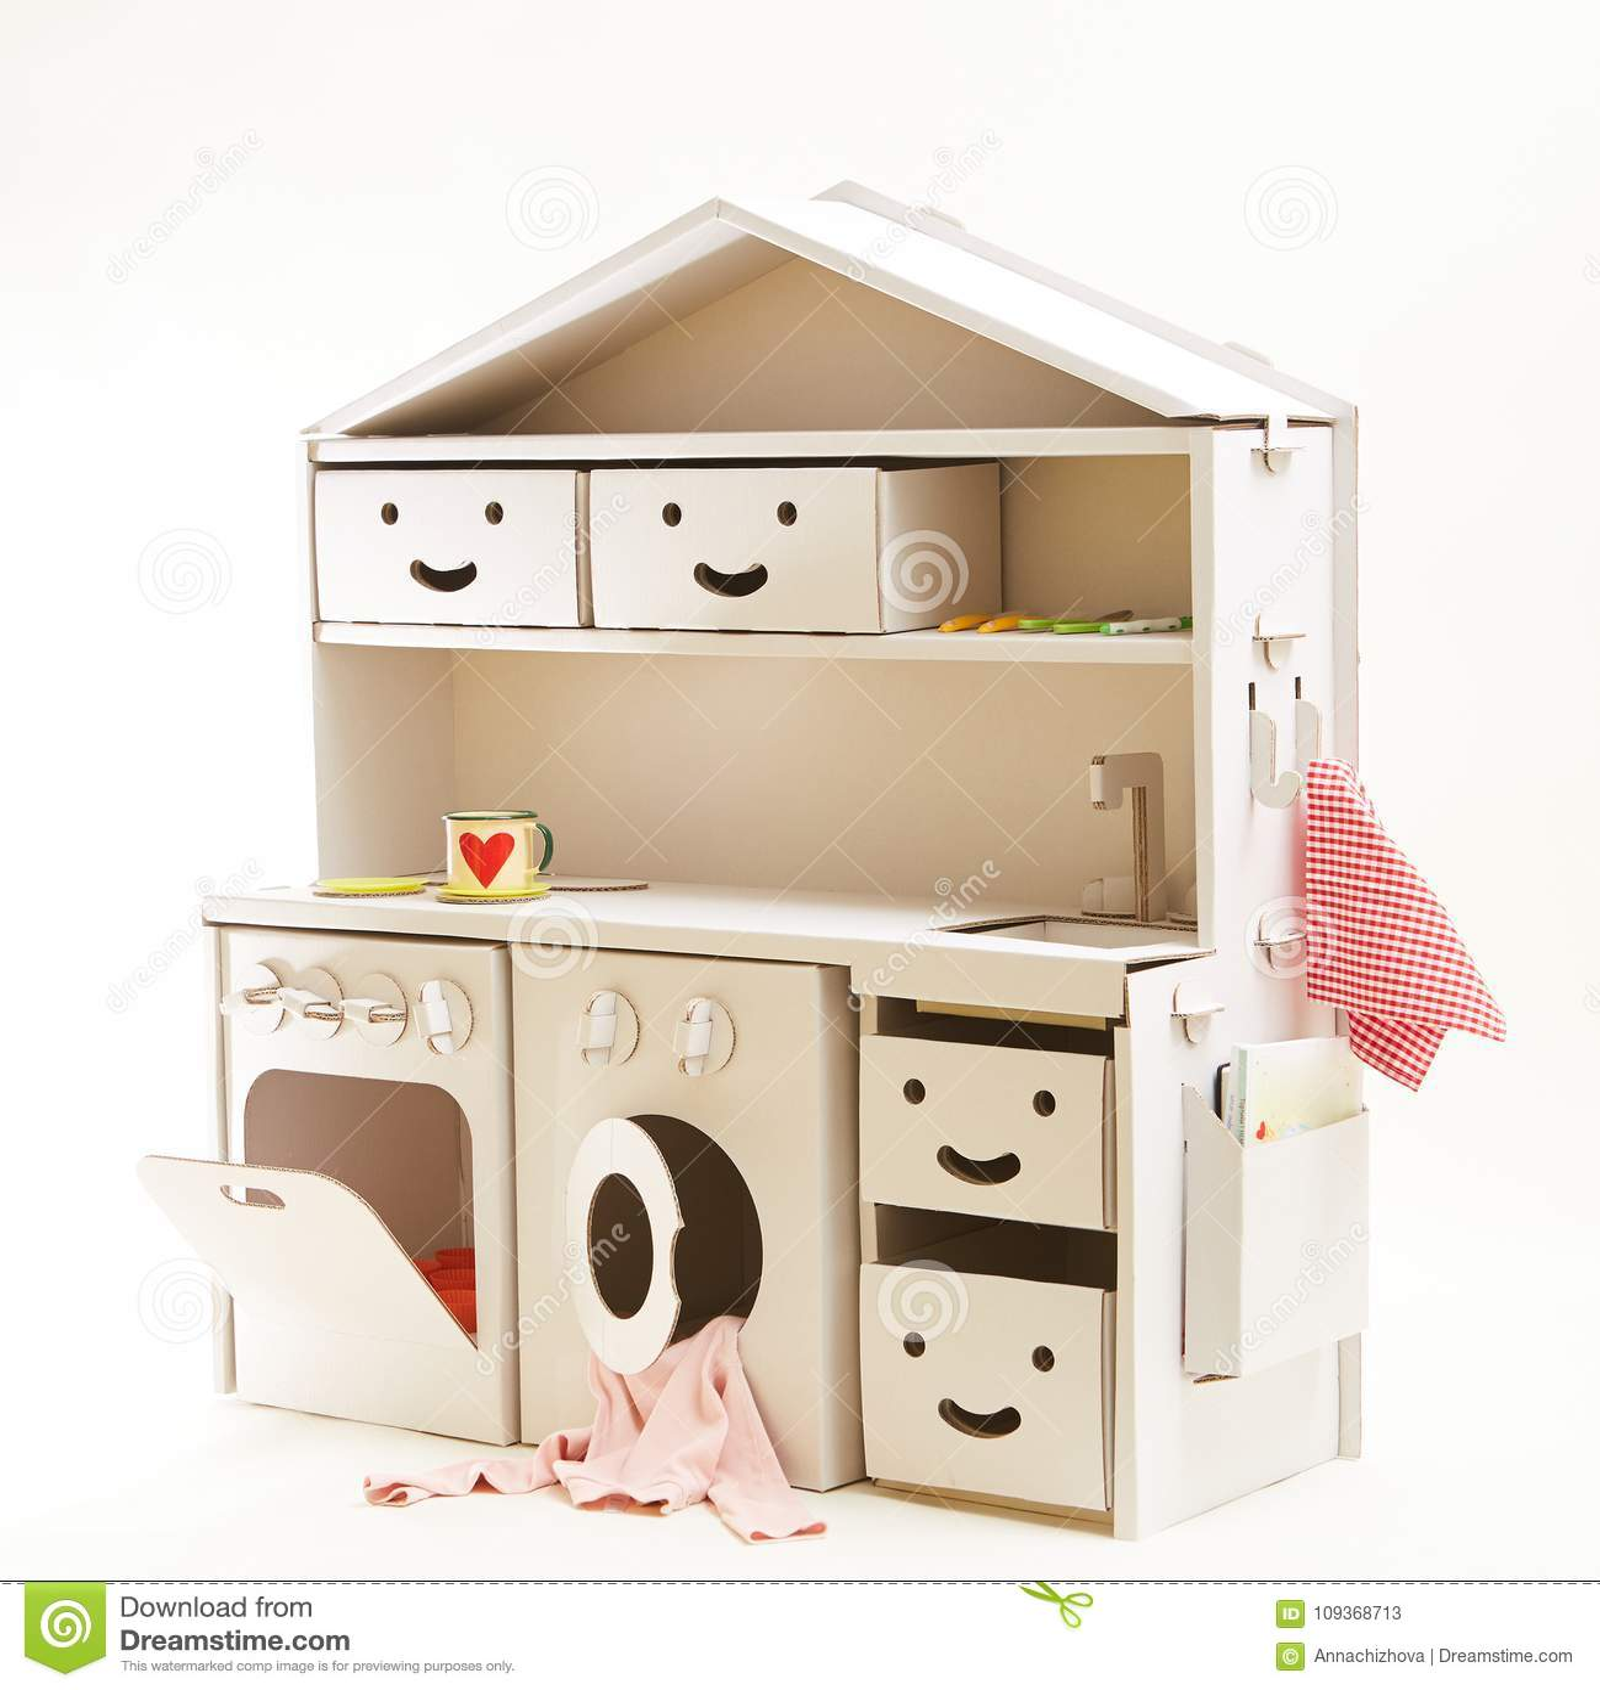 childrens toy kitchen building an outdoor 儿童纸板玩具厨房库存图片 图片包括有烹调 少许 逗人喜爱 厨师 房子 儿童纸板玩具厨房